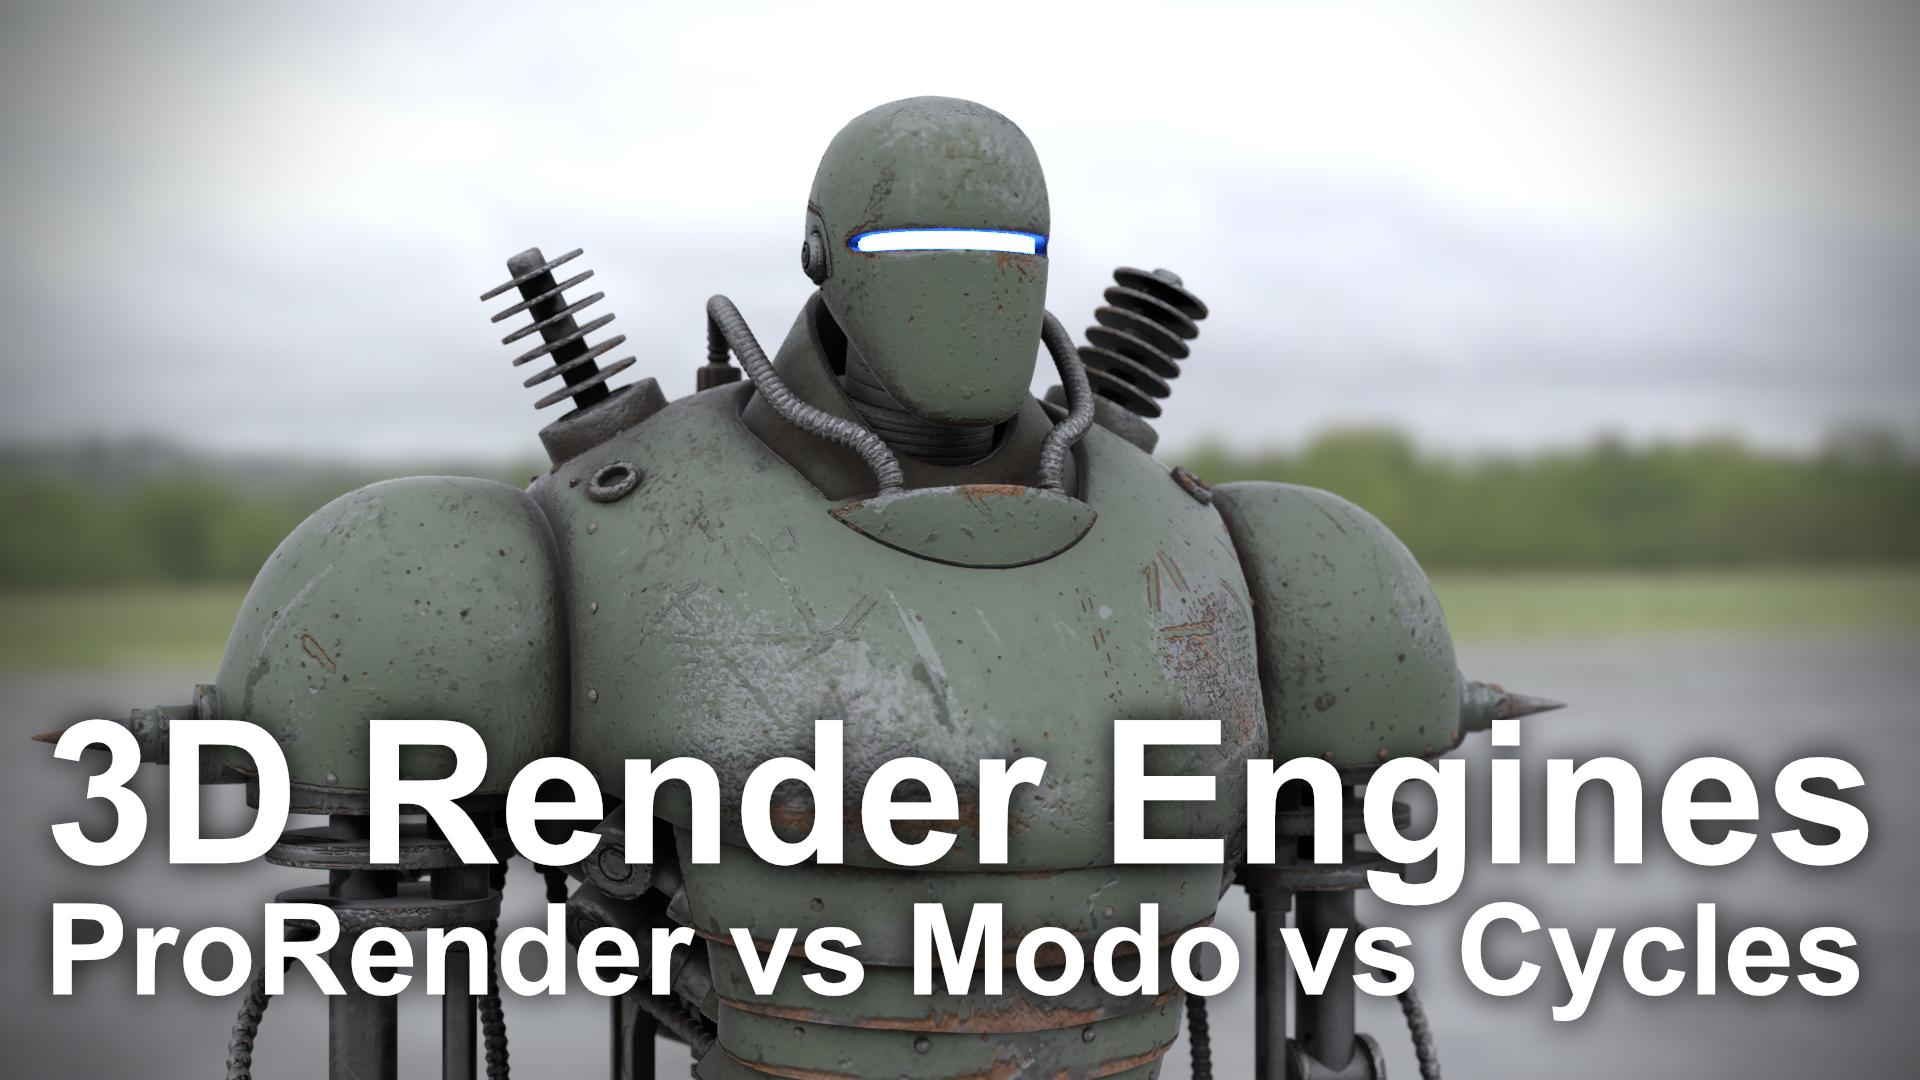 ProRender vs Modo vs Cycles - PBR 3D Render Comparison